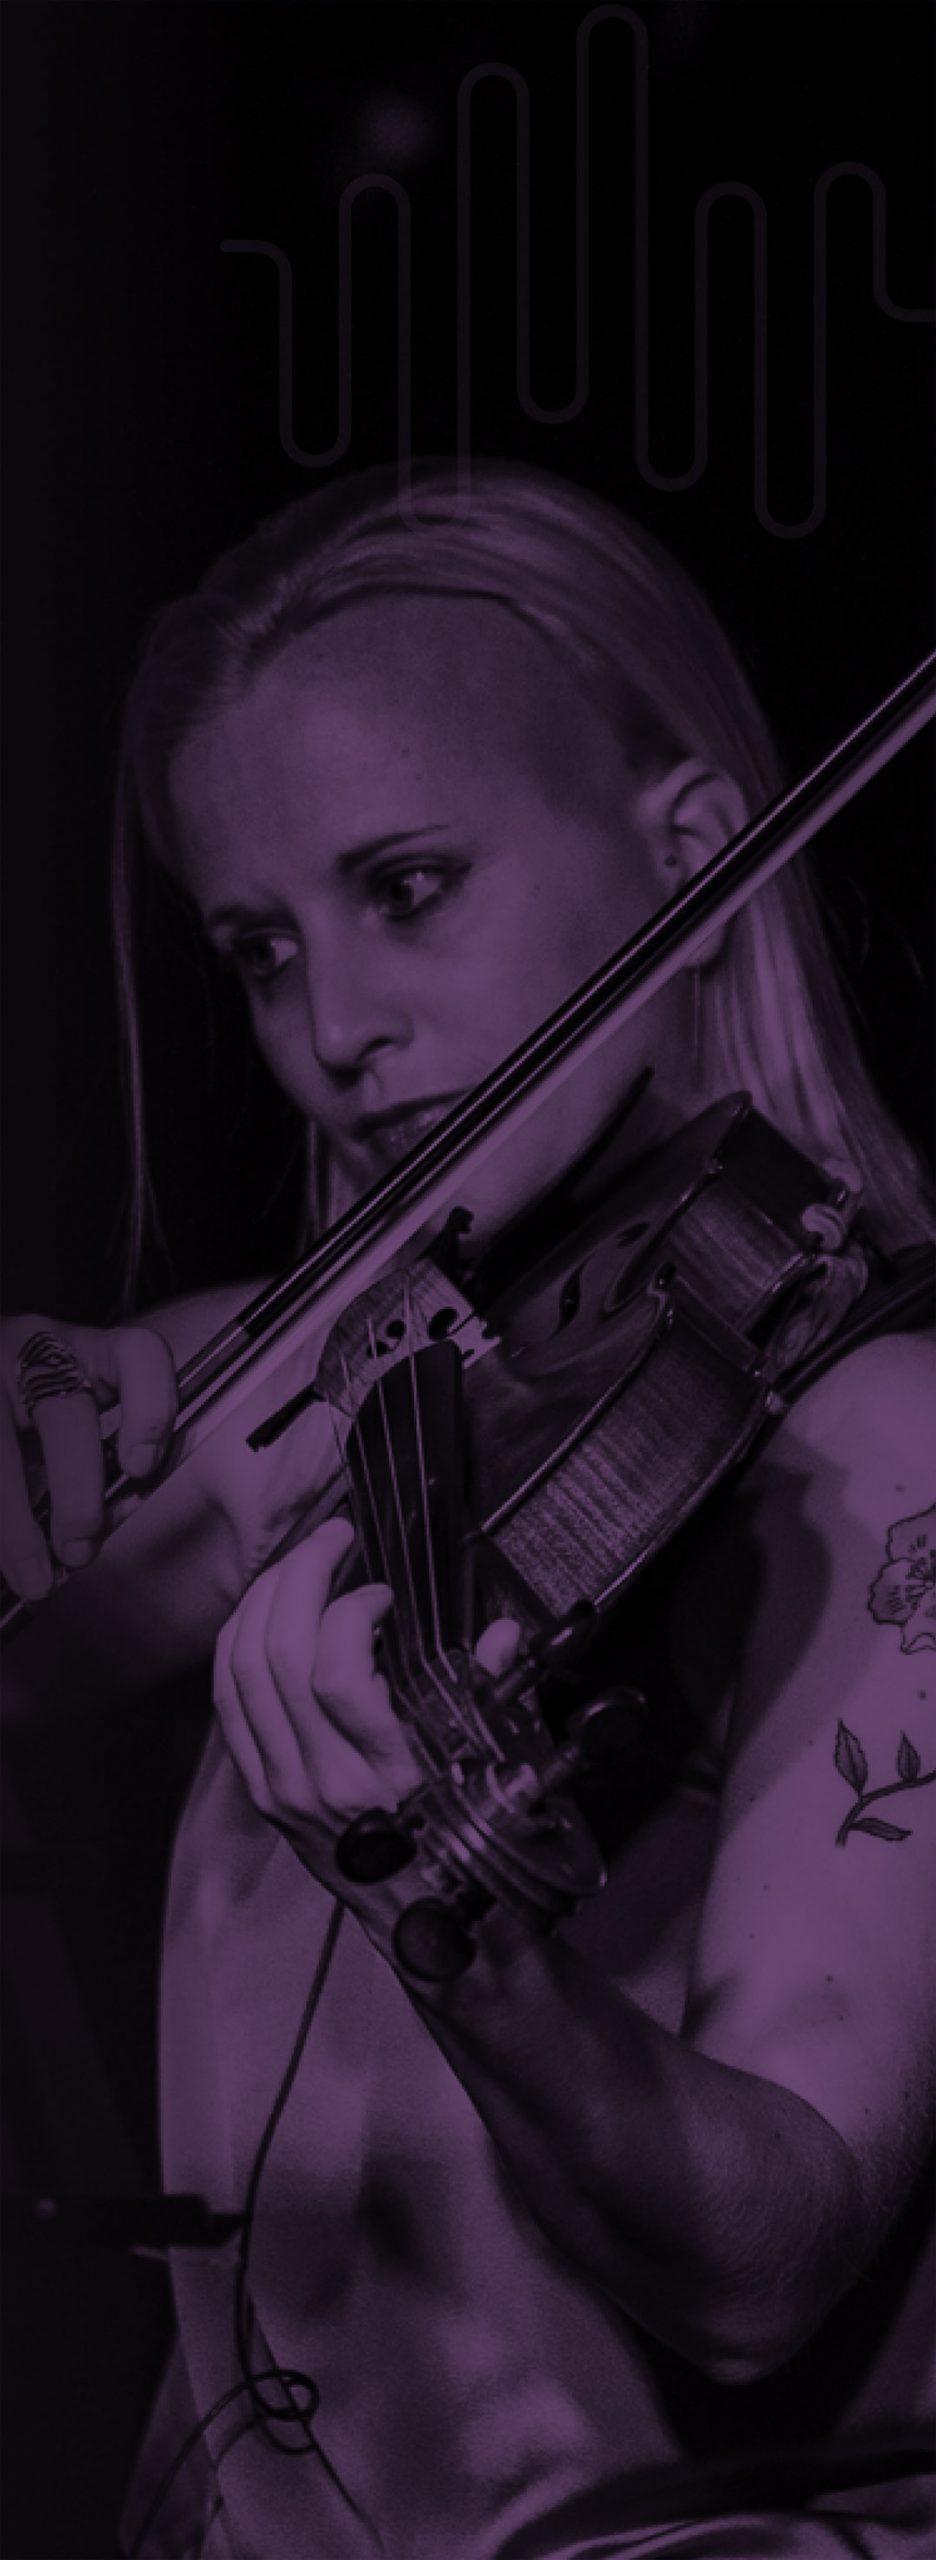 Micha Jackson| Photograph by Steve Kelk for Foldback Media